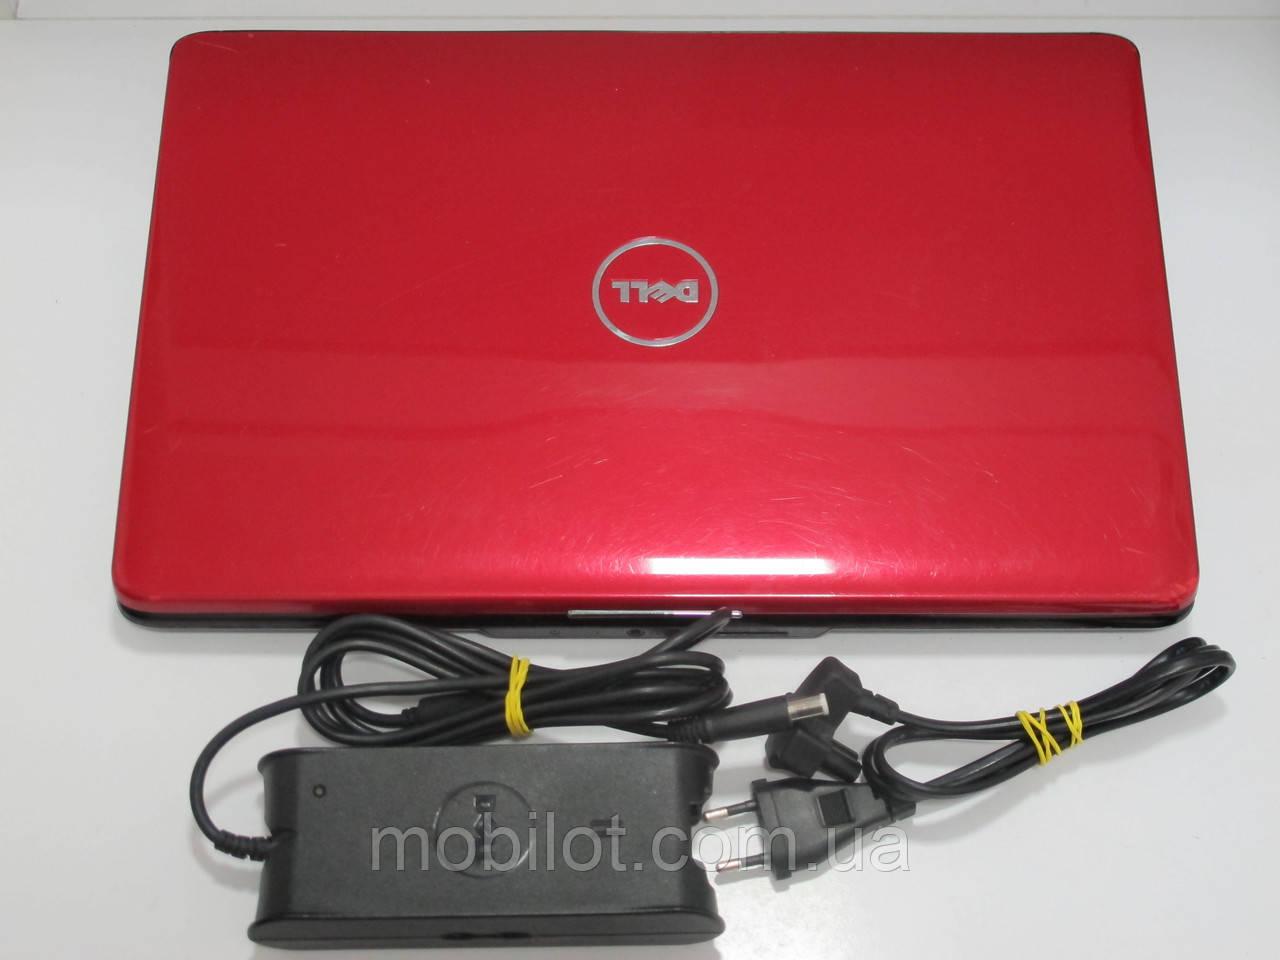 Ноутбук Dell Inspiron 1545 (PP41L) (NR-6400)